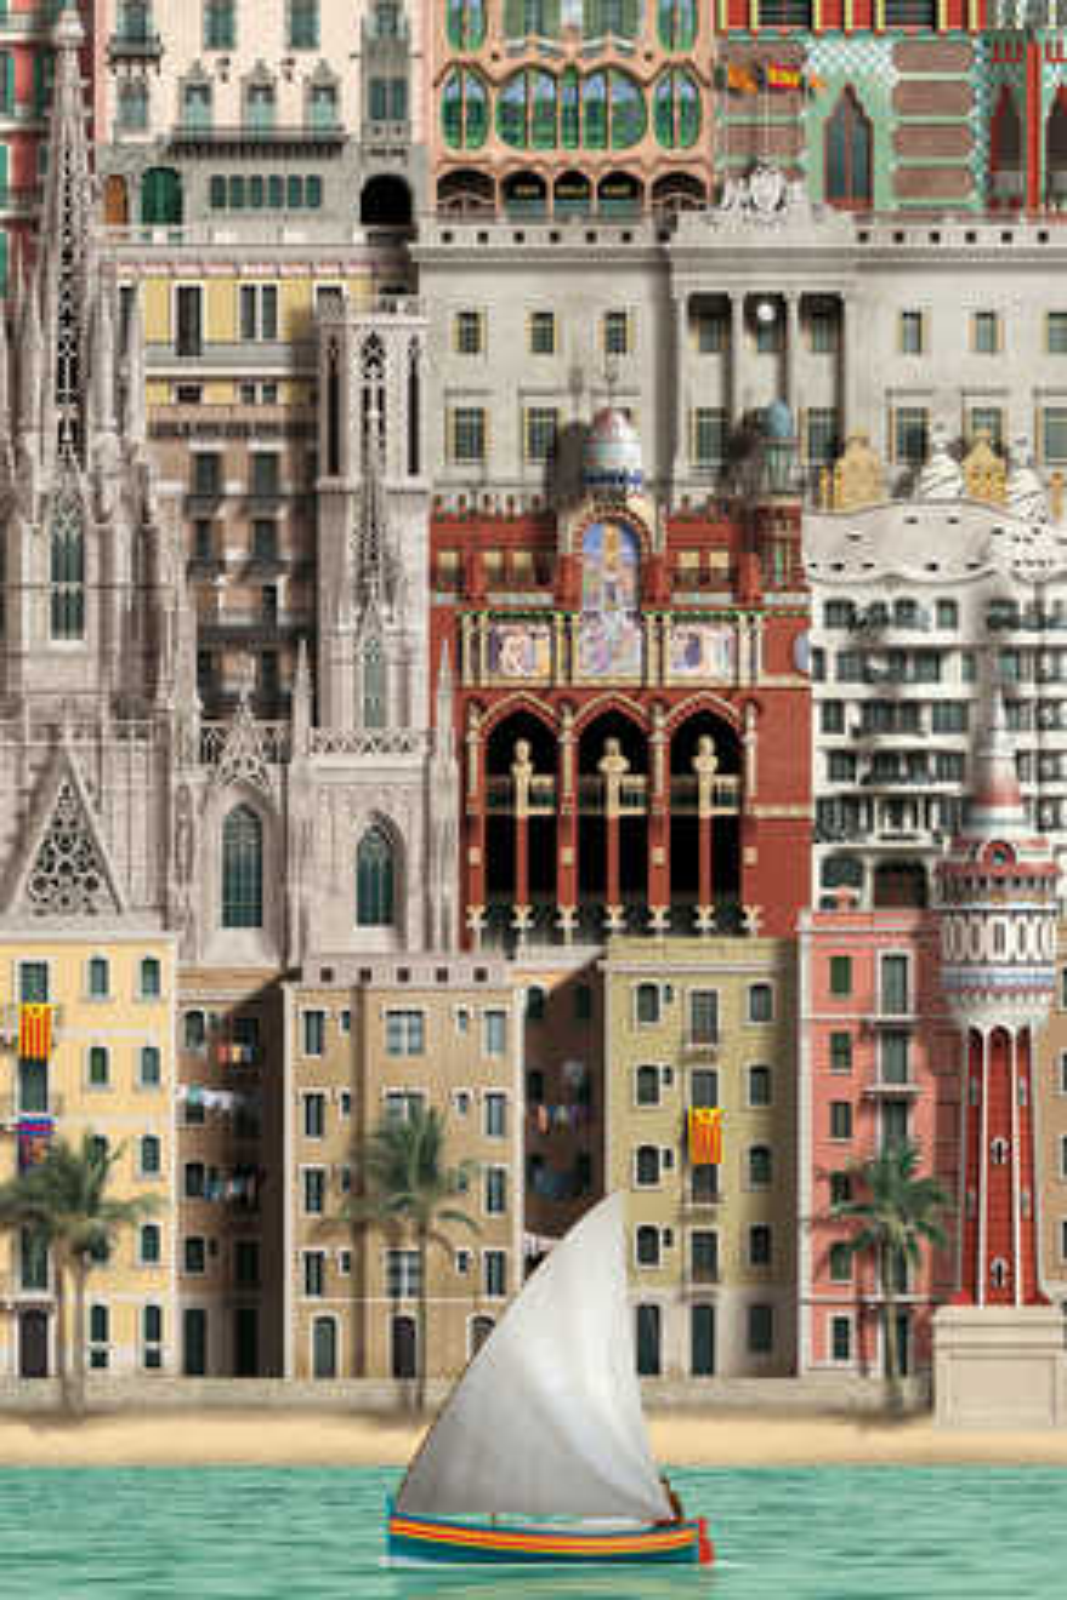 Barcelona IV - Martin Schwartz